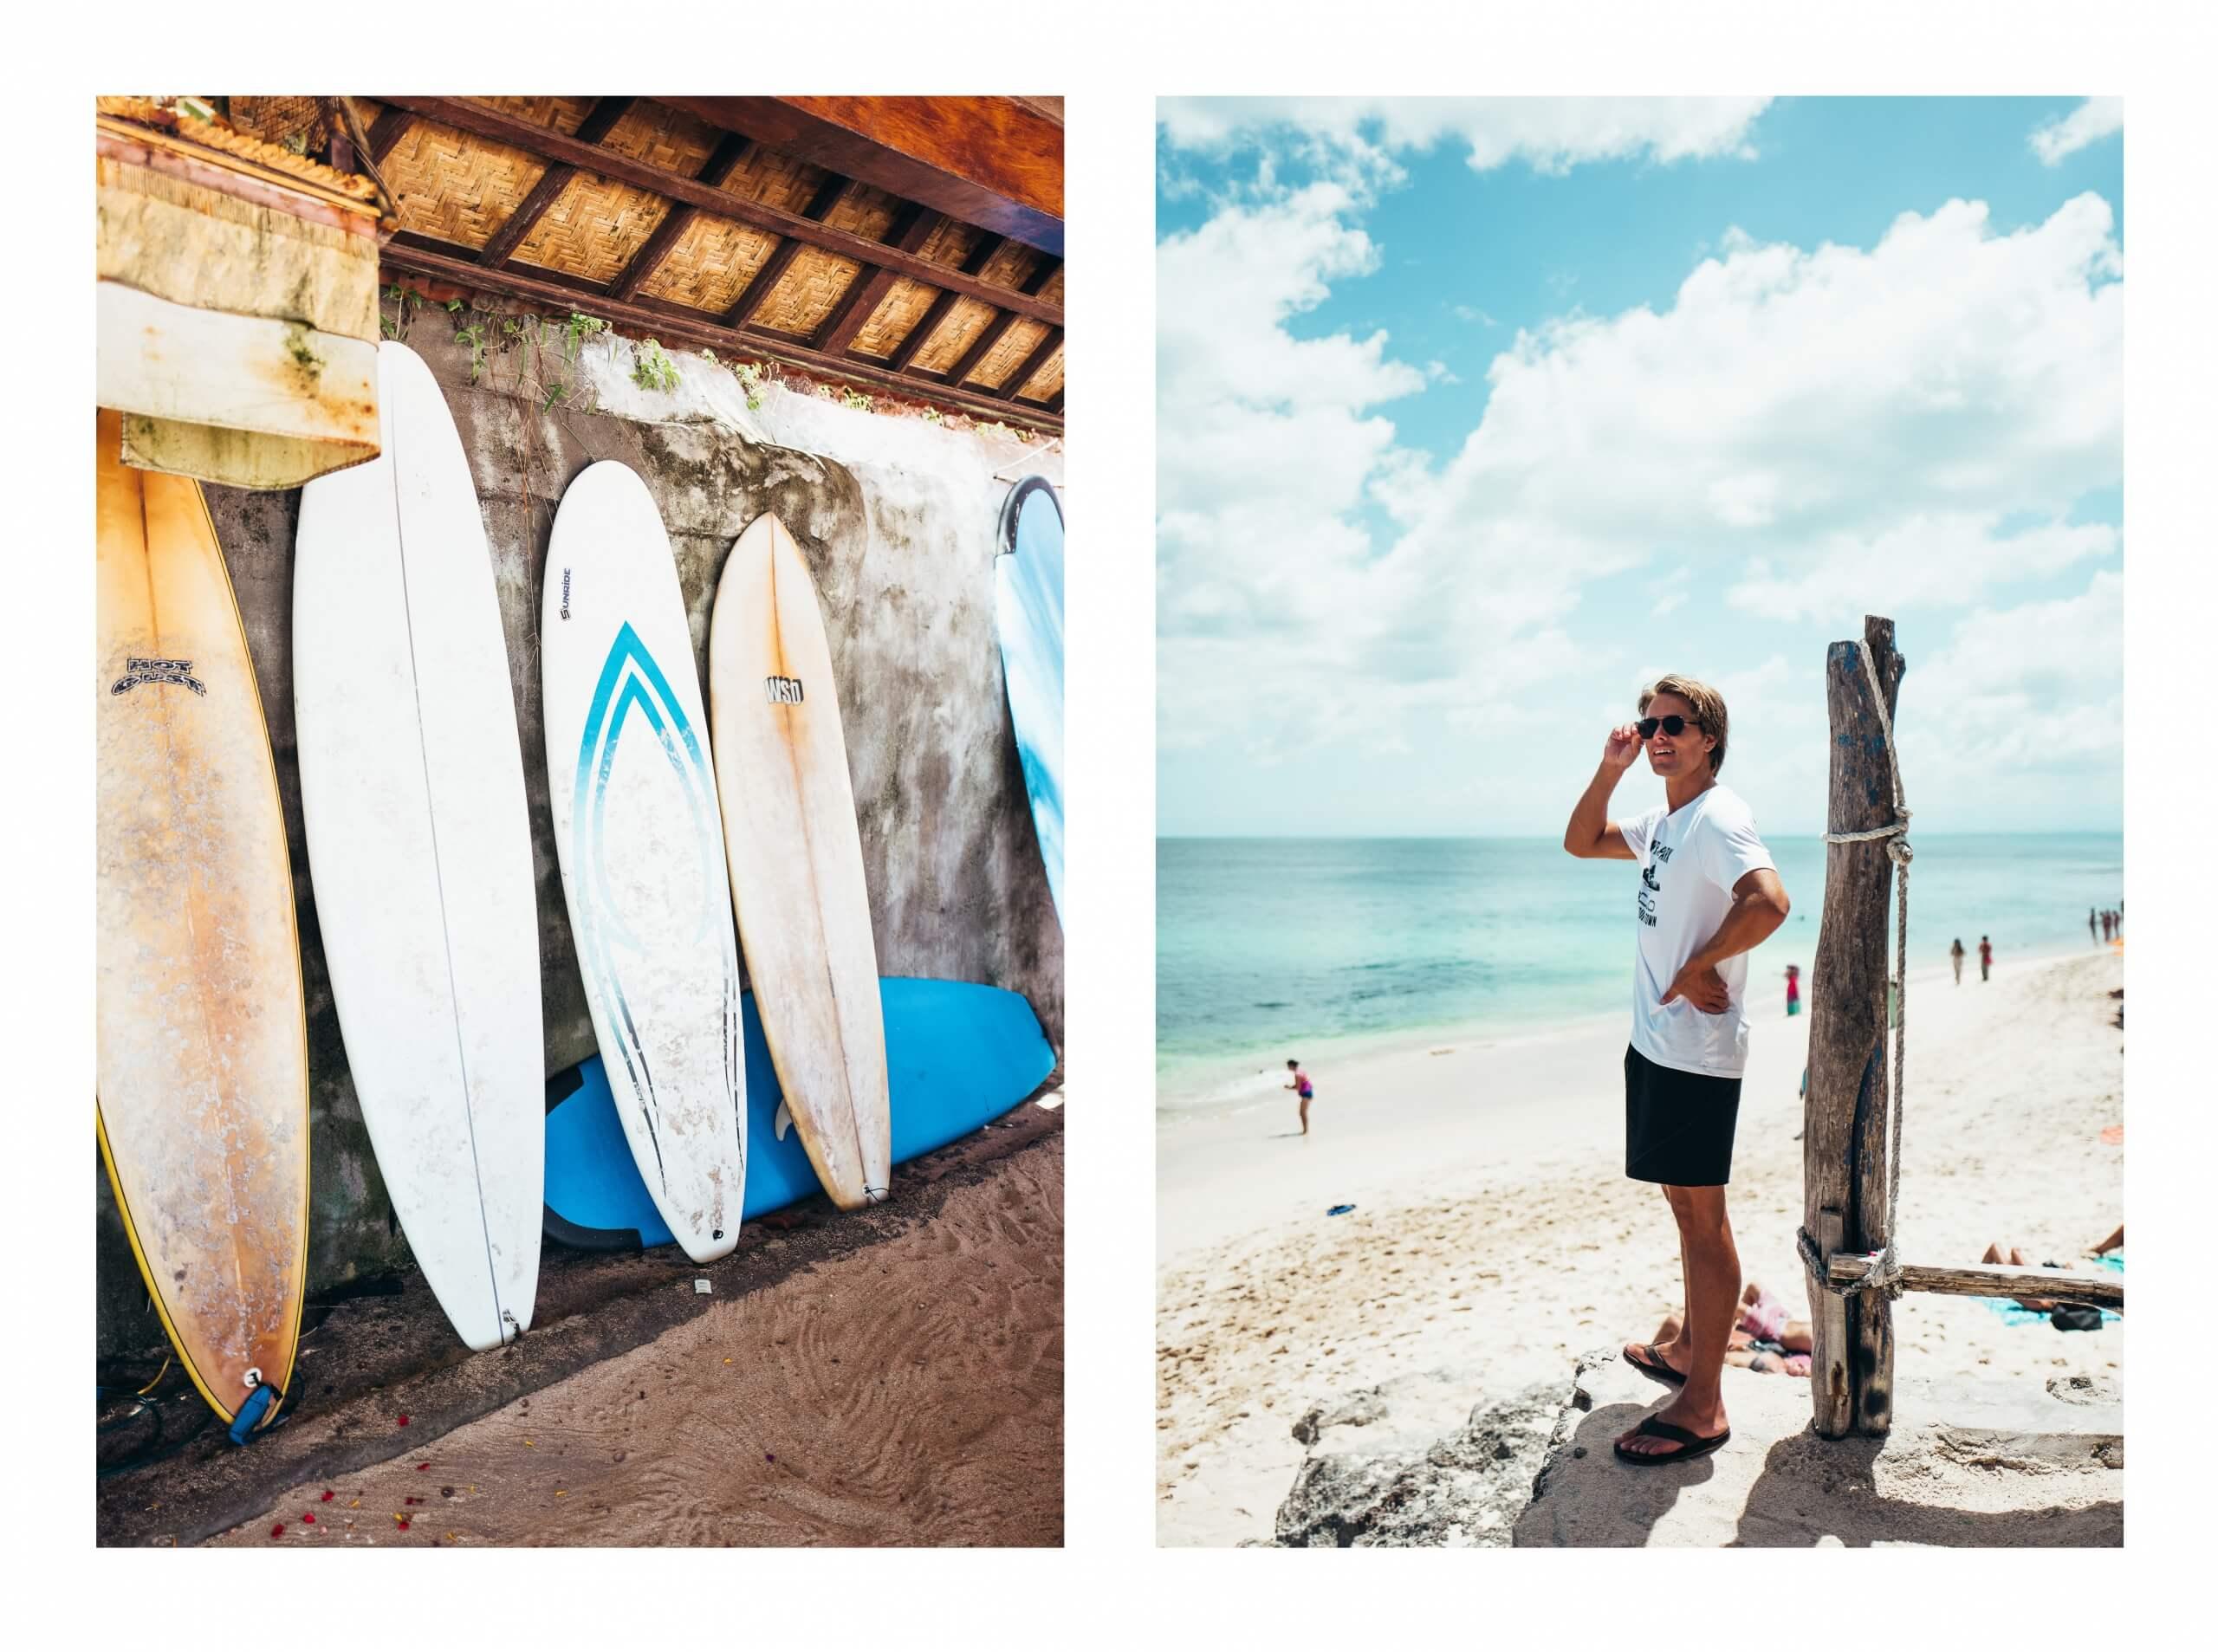 janni-deler-dreamland-beach-baliL1010613 copy